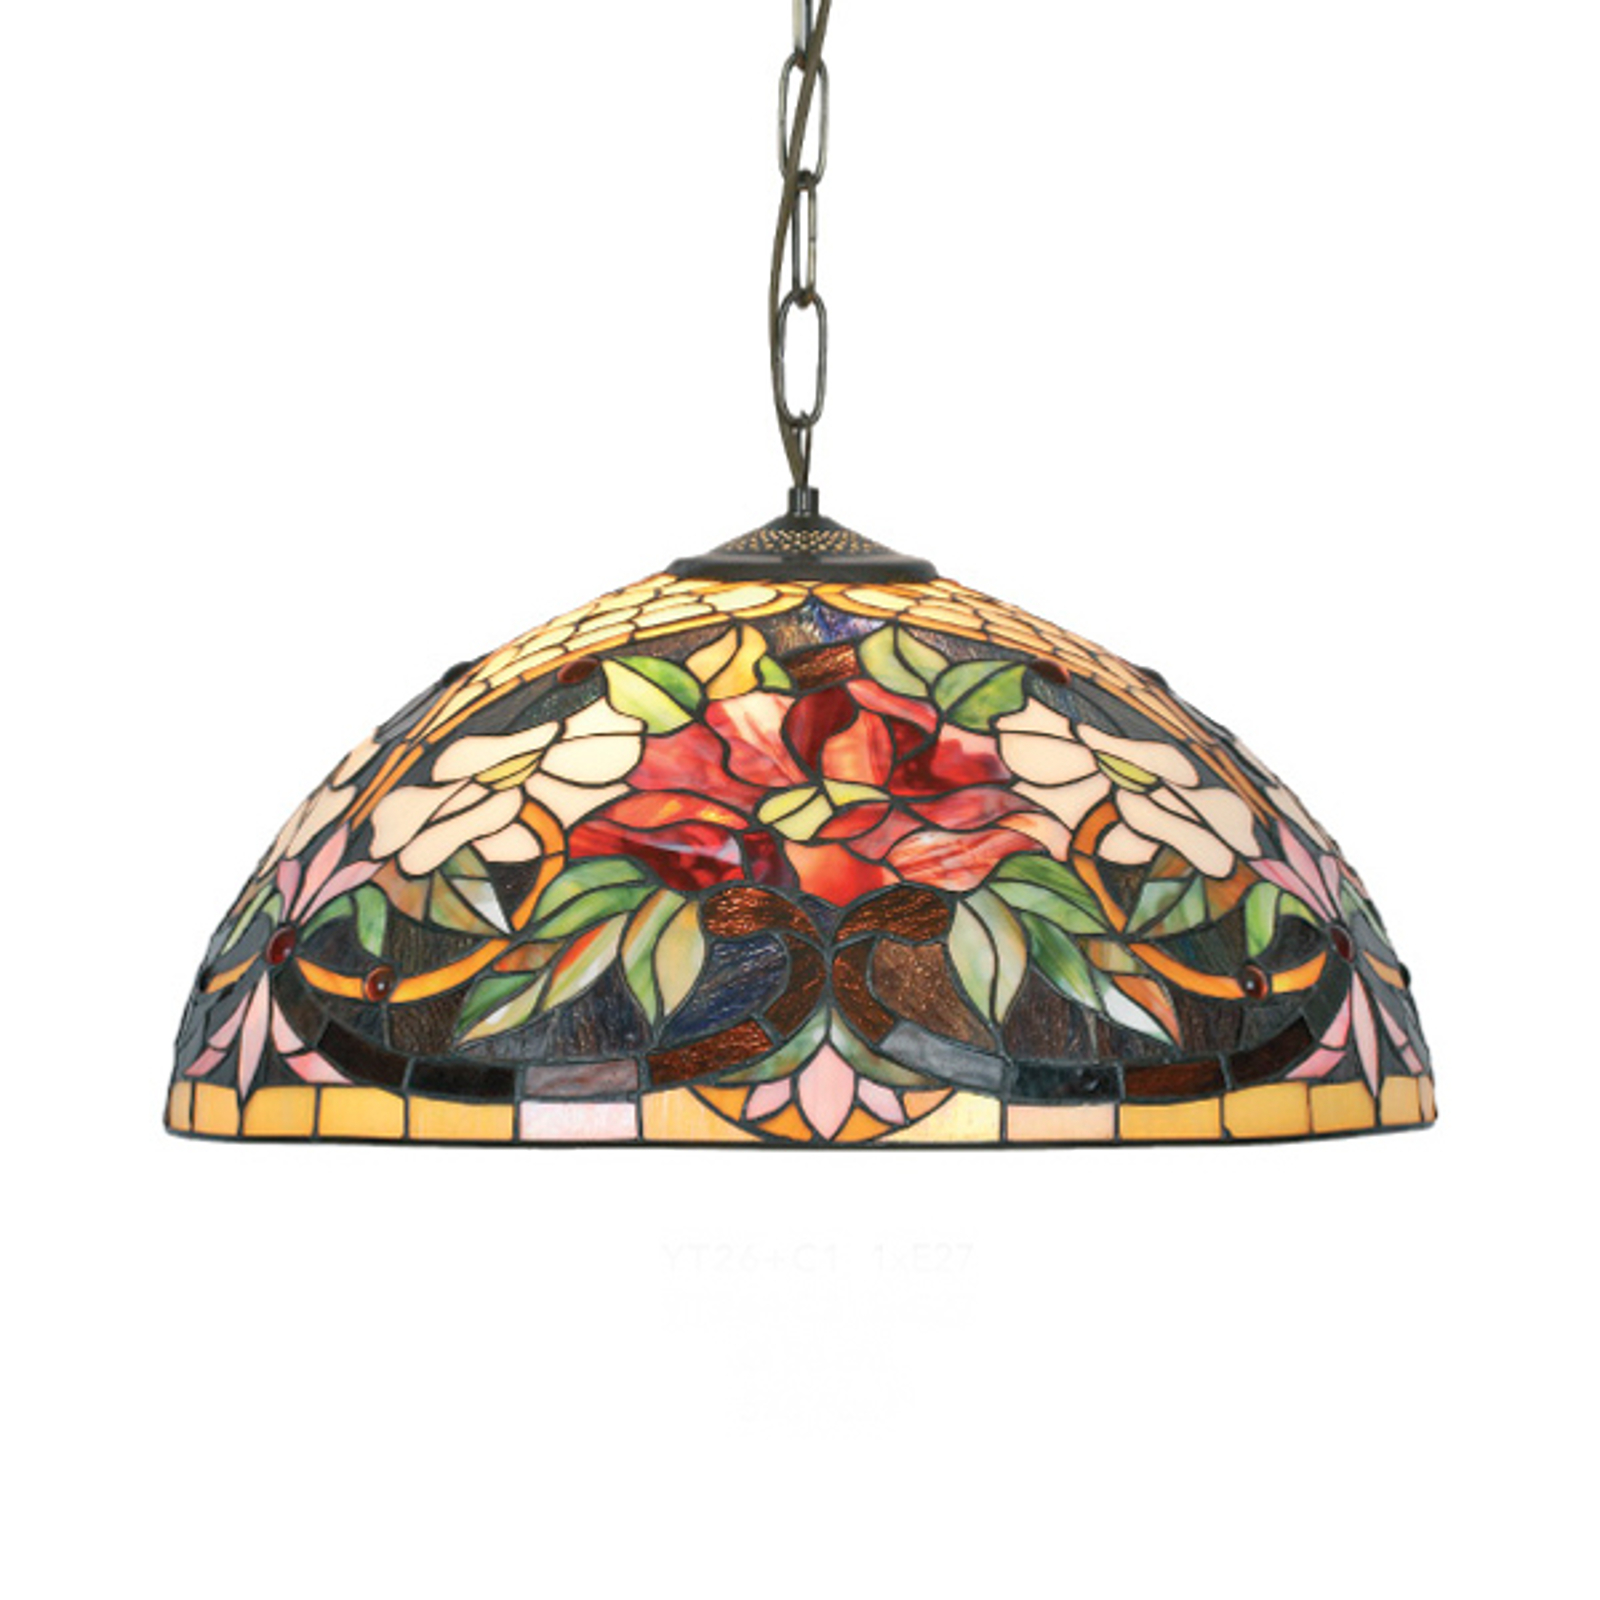 Hanglamp Ariadne in Tiffany-stijl 1-lichts